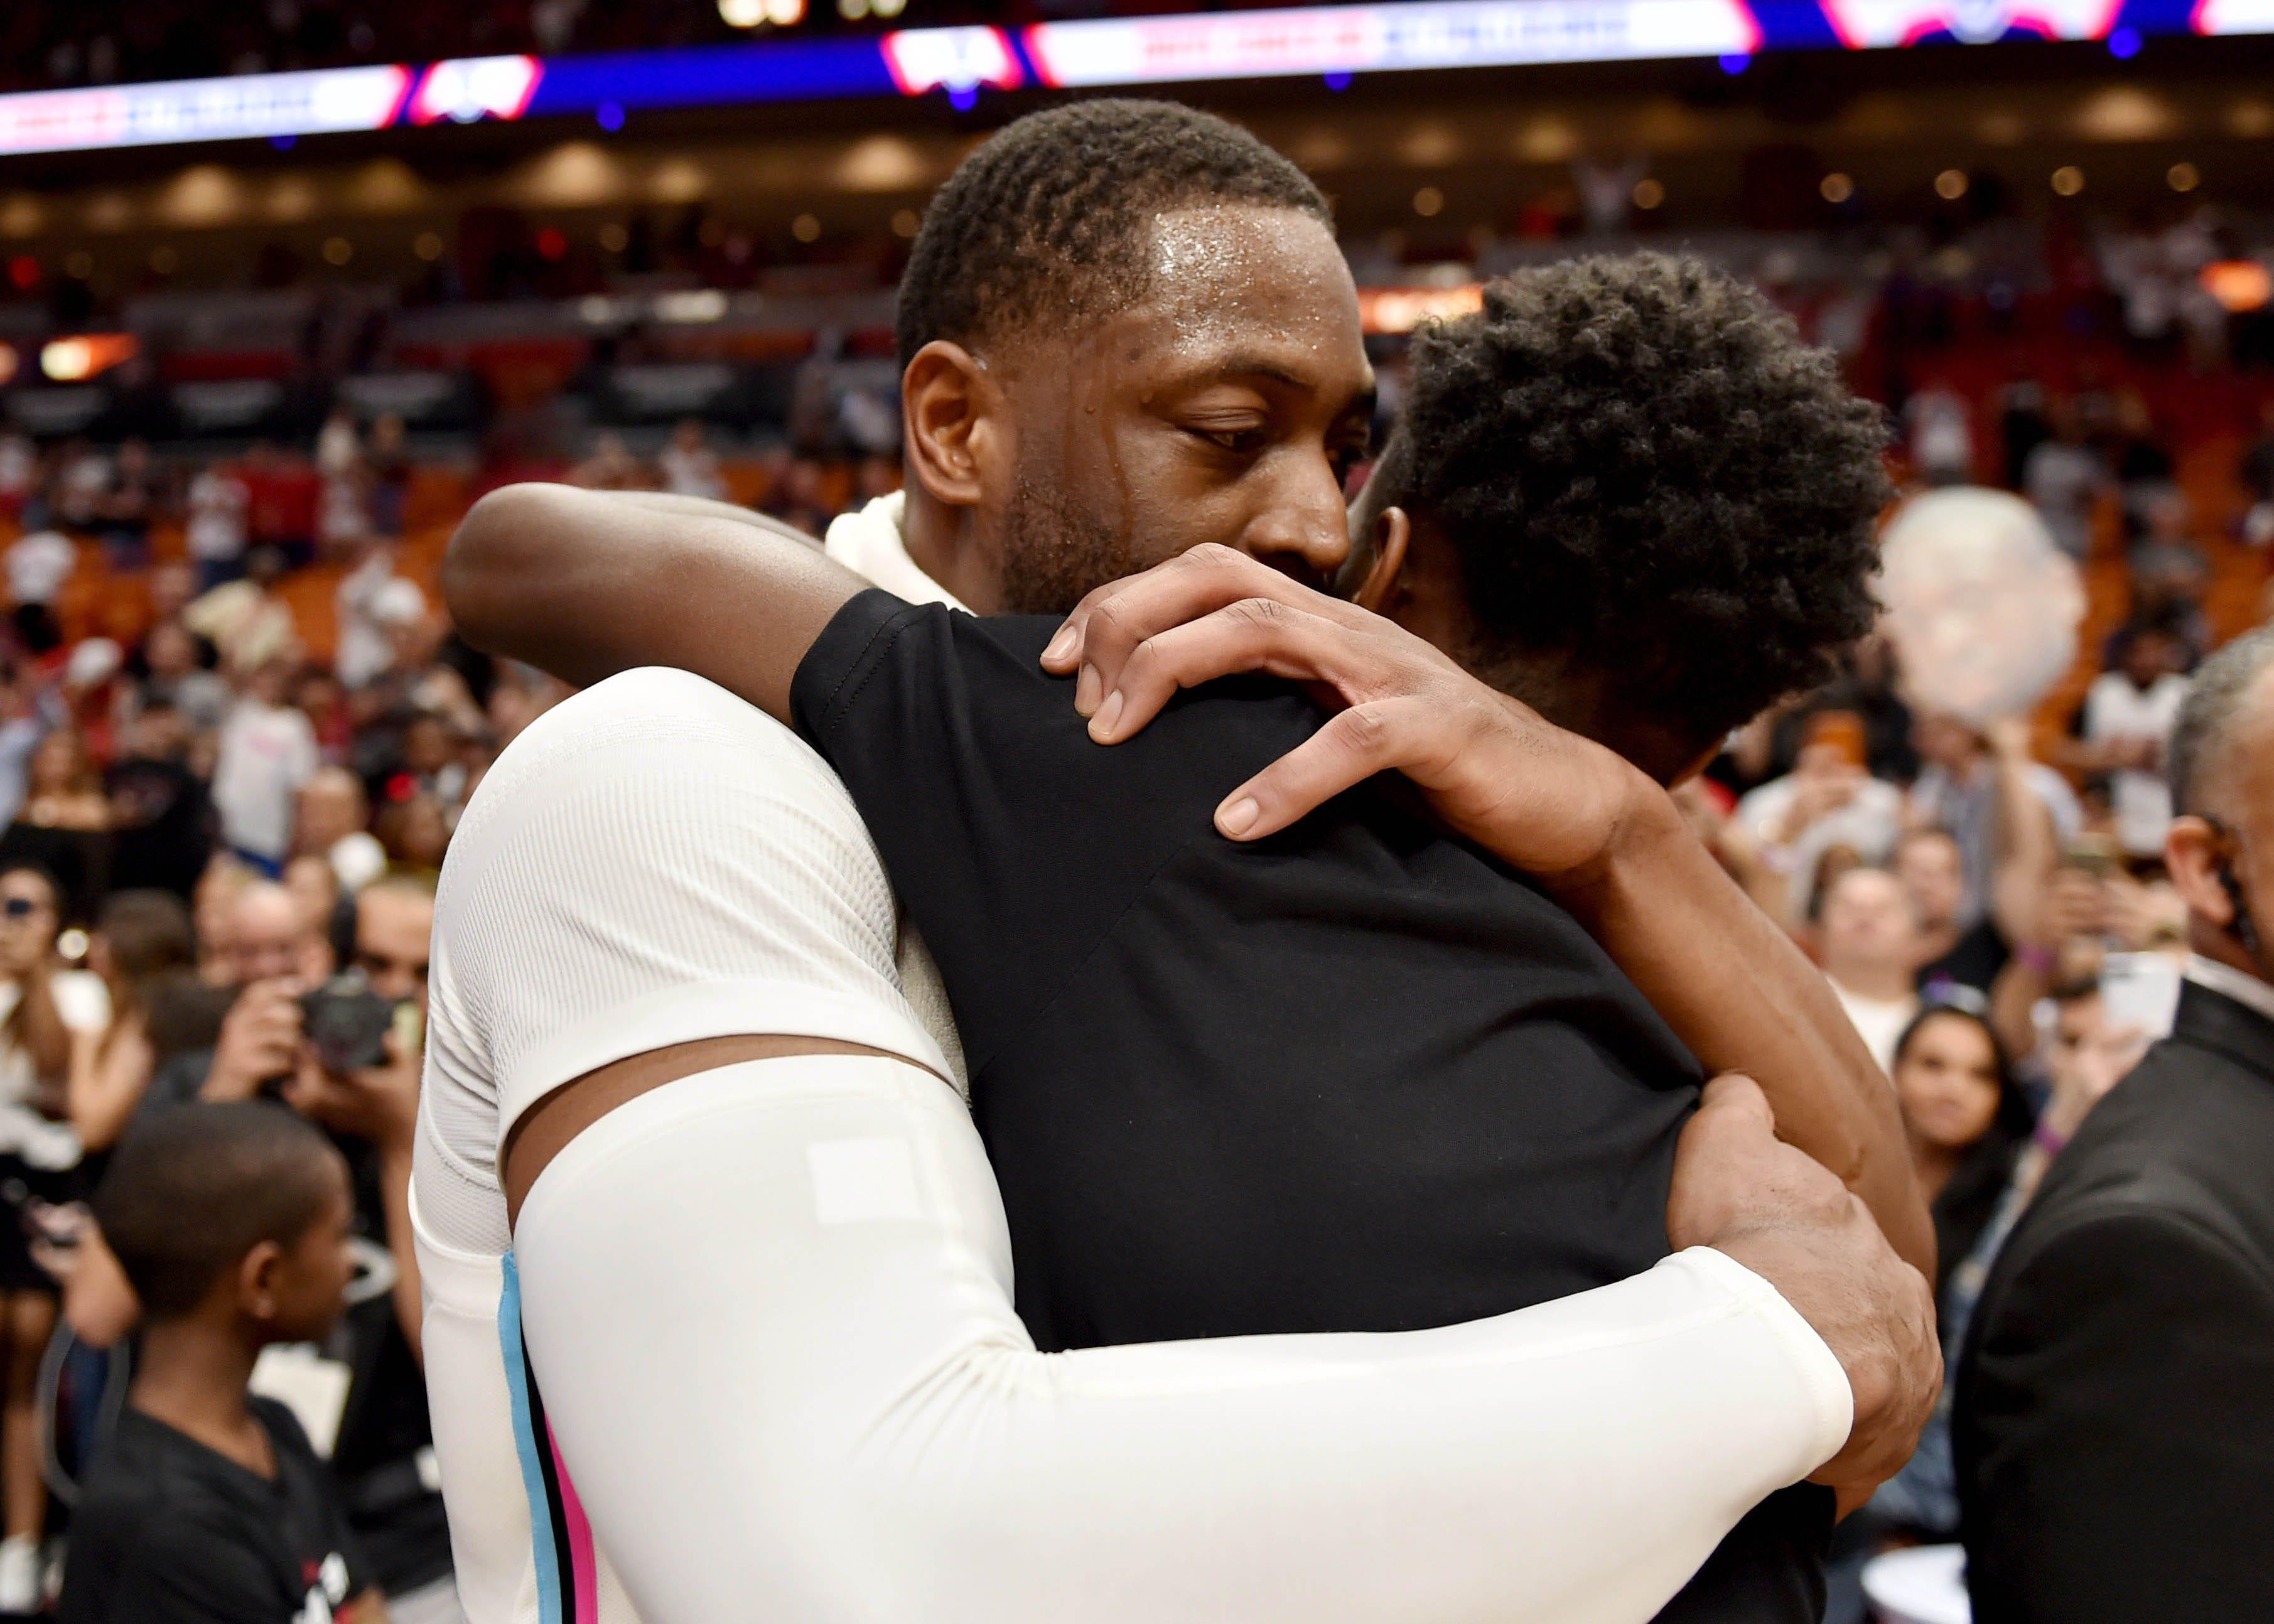 Feb 9, 2018: Dwyane Wade hugs his son Zaire.